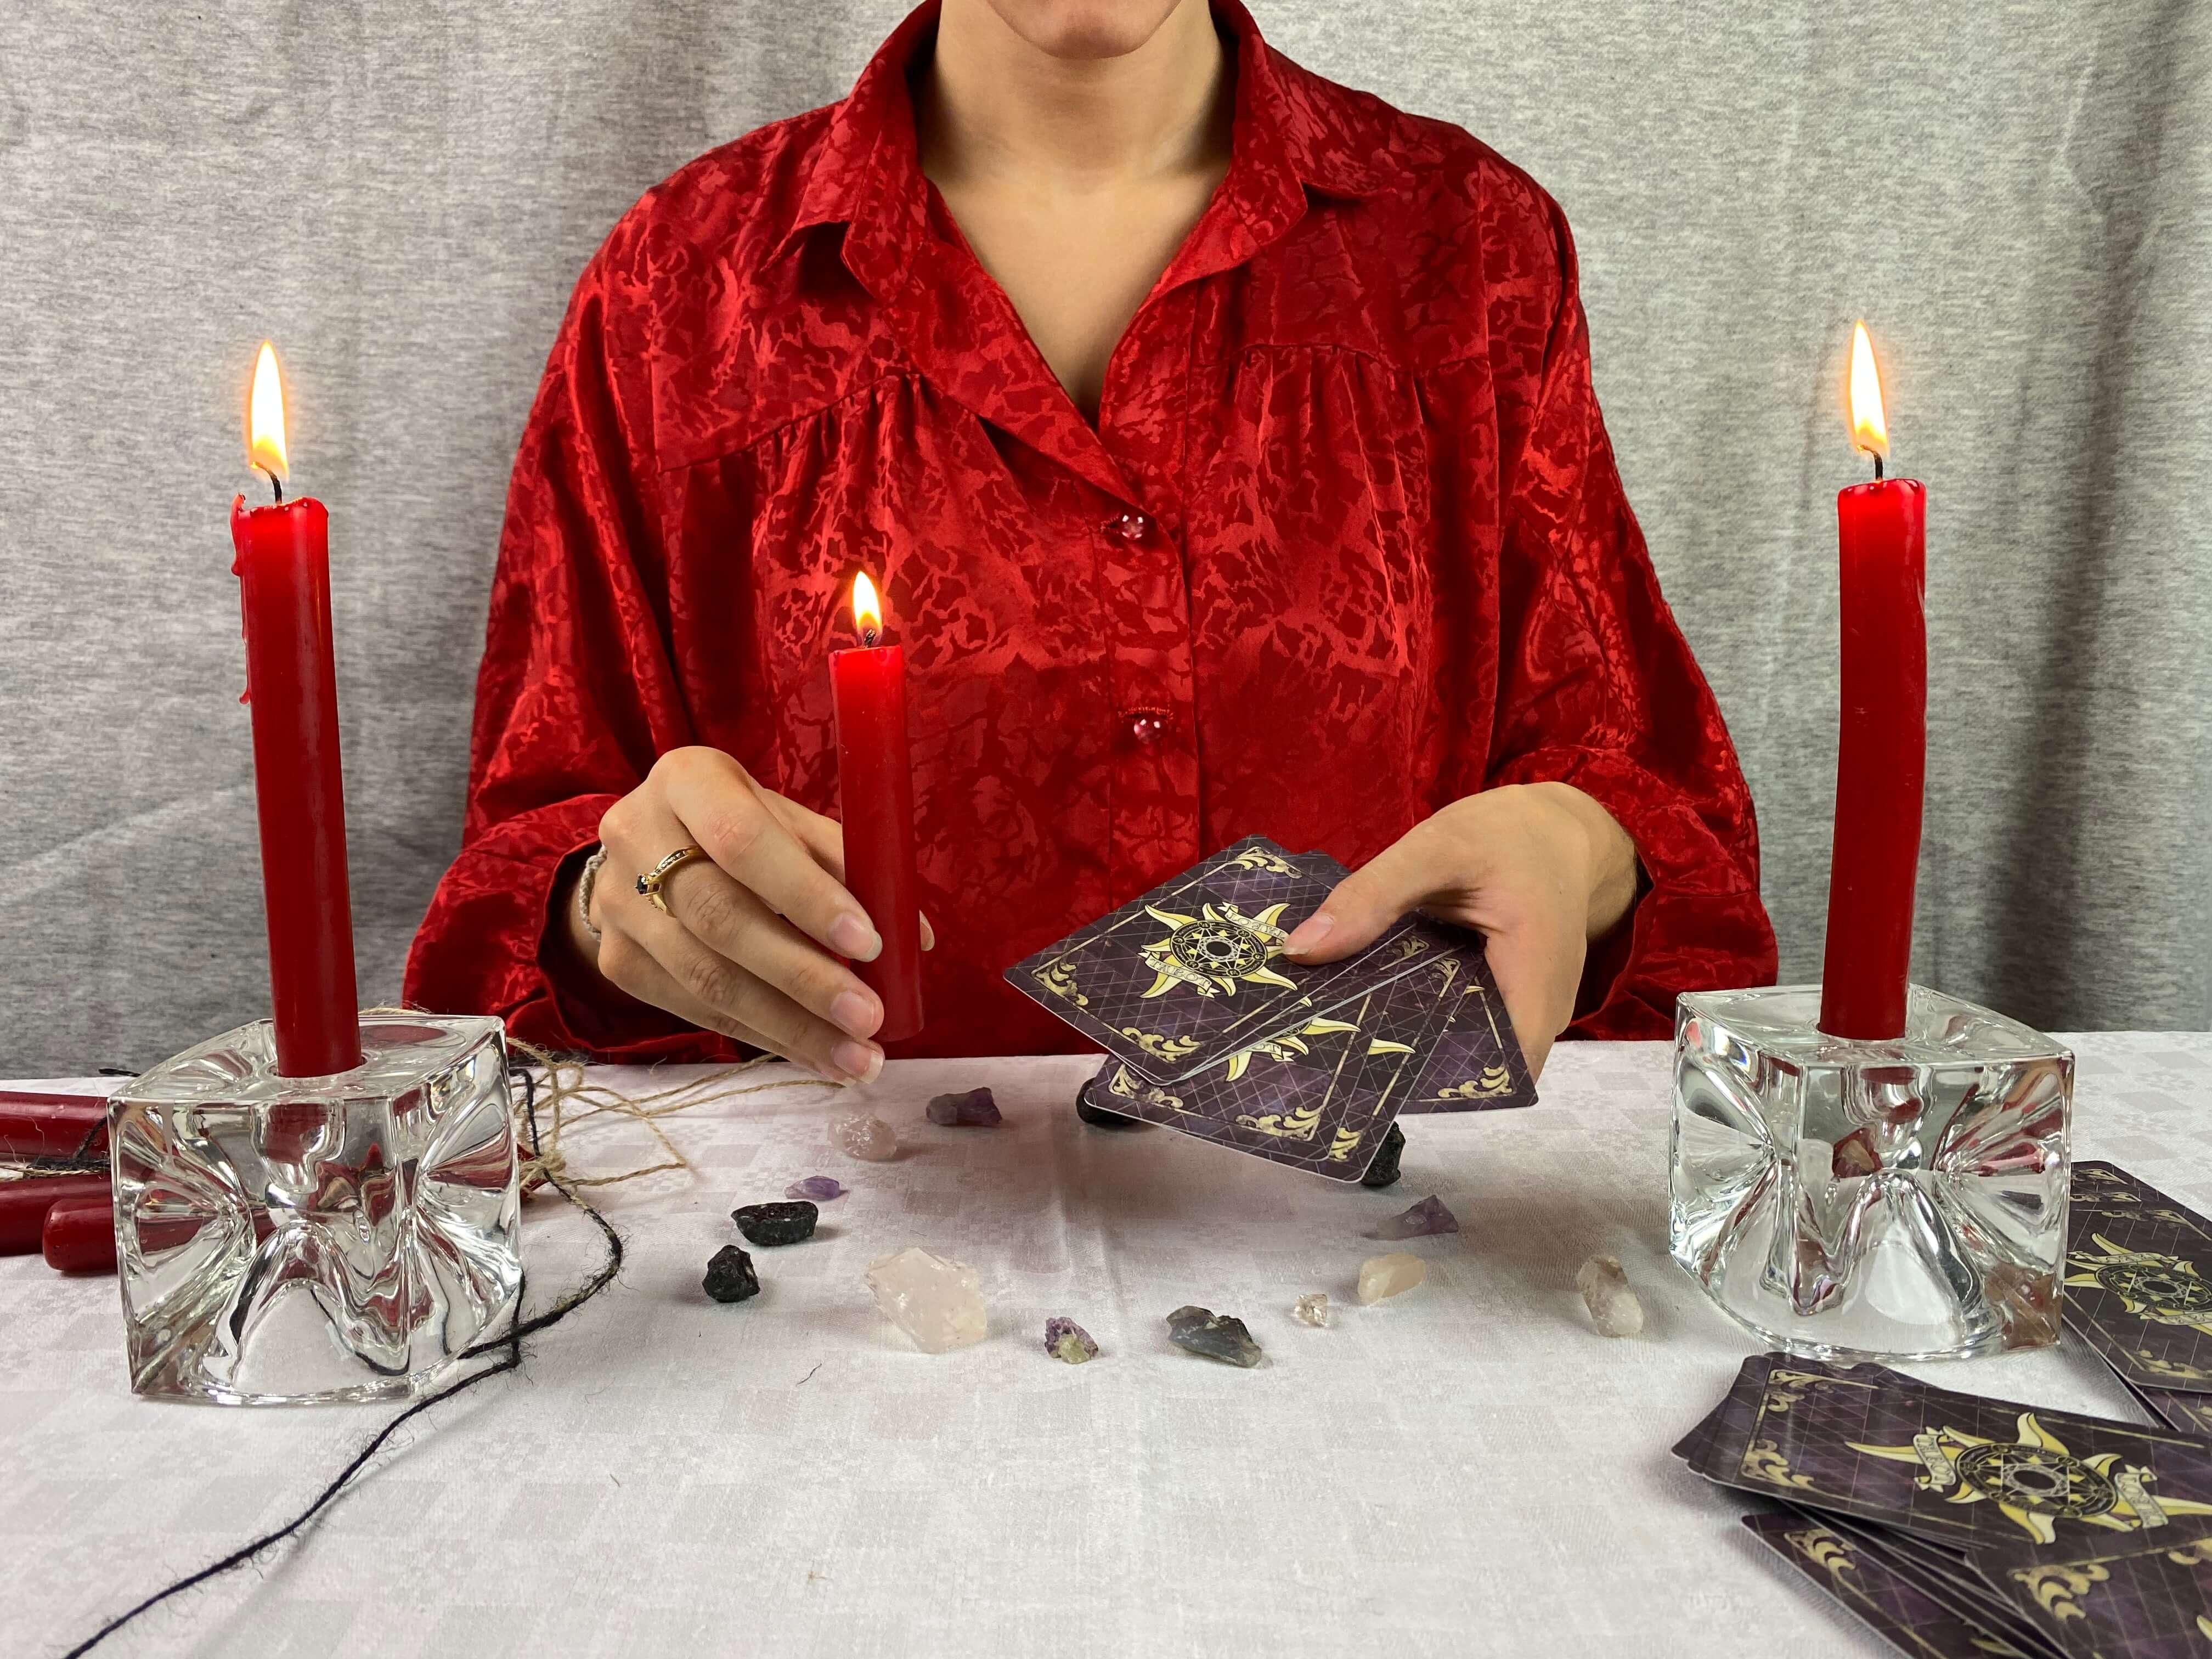 voyance consultation tarot